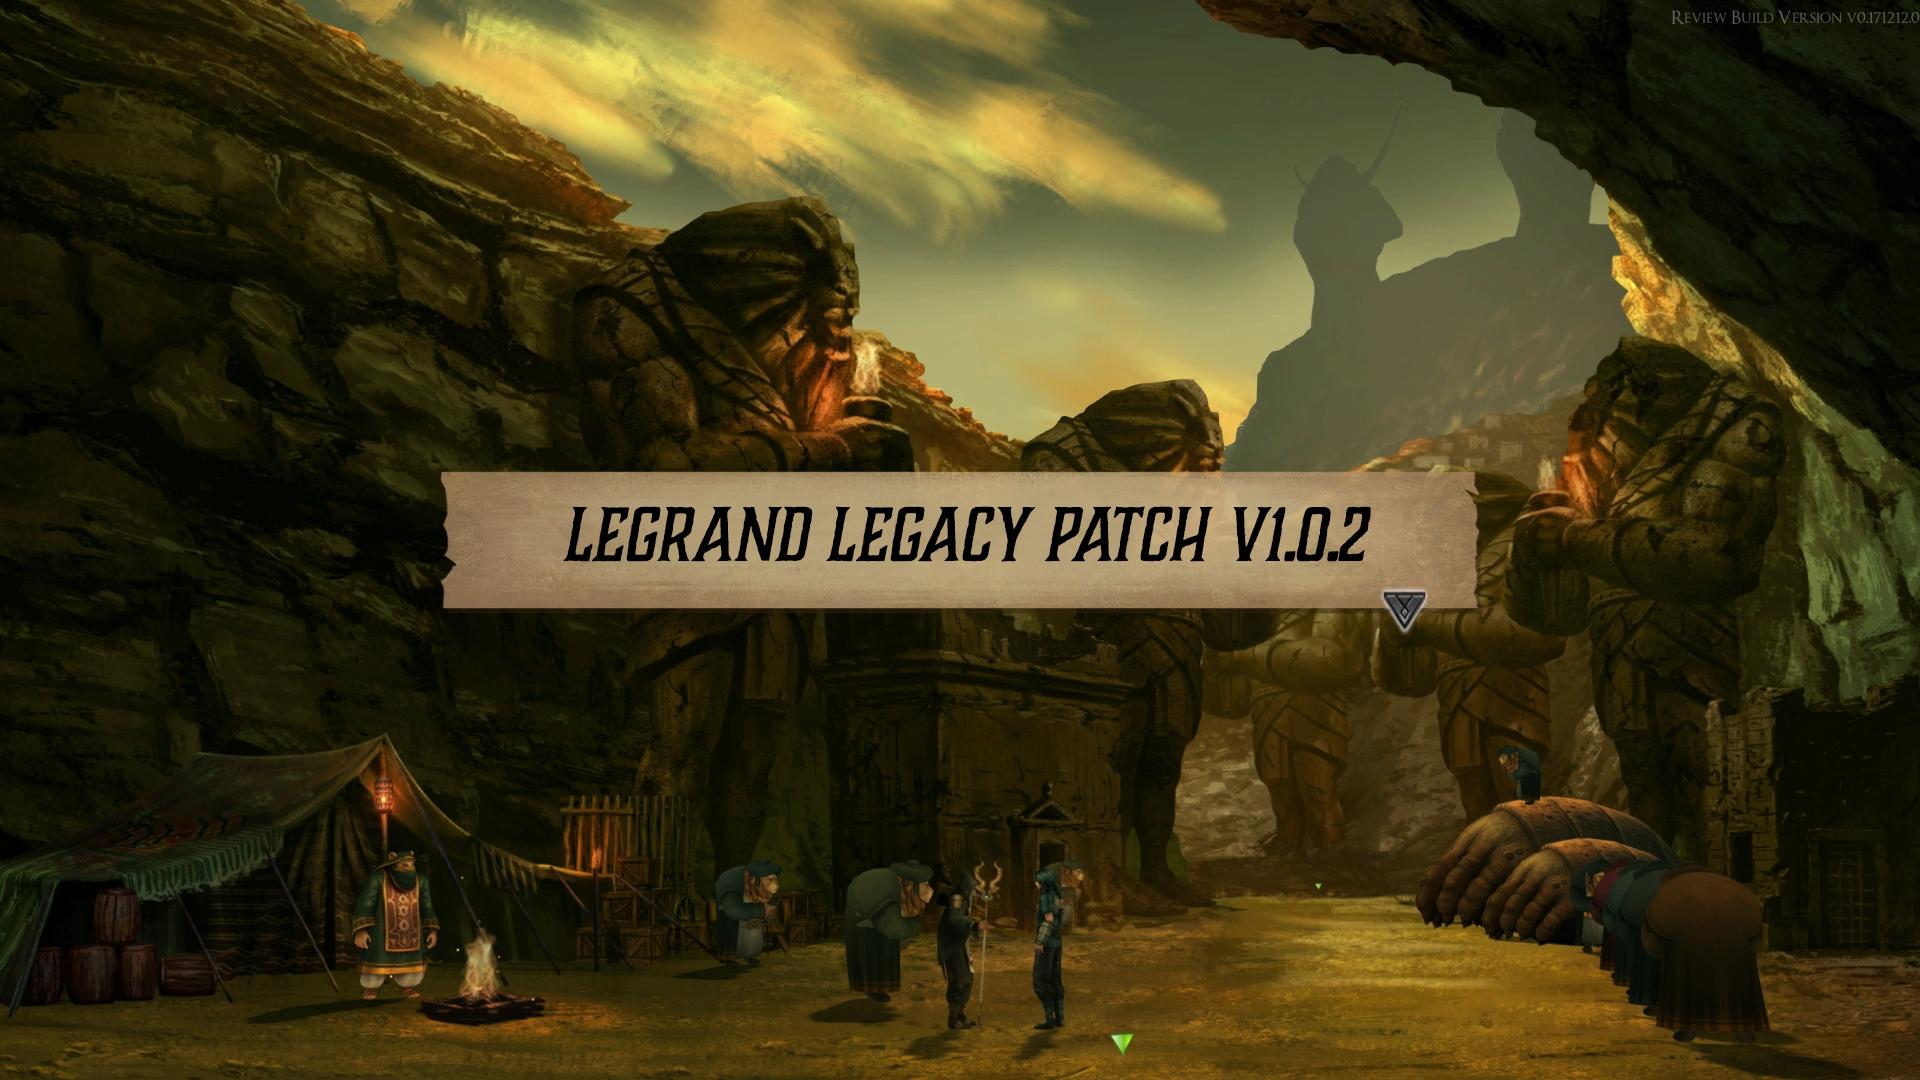 Legrand Legacy :: LEGRAND LEGACY PATCH V1 0 2